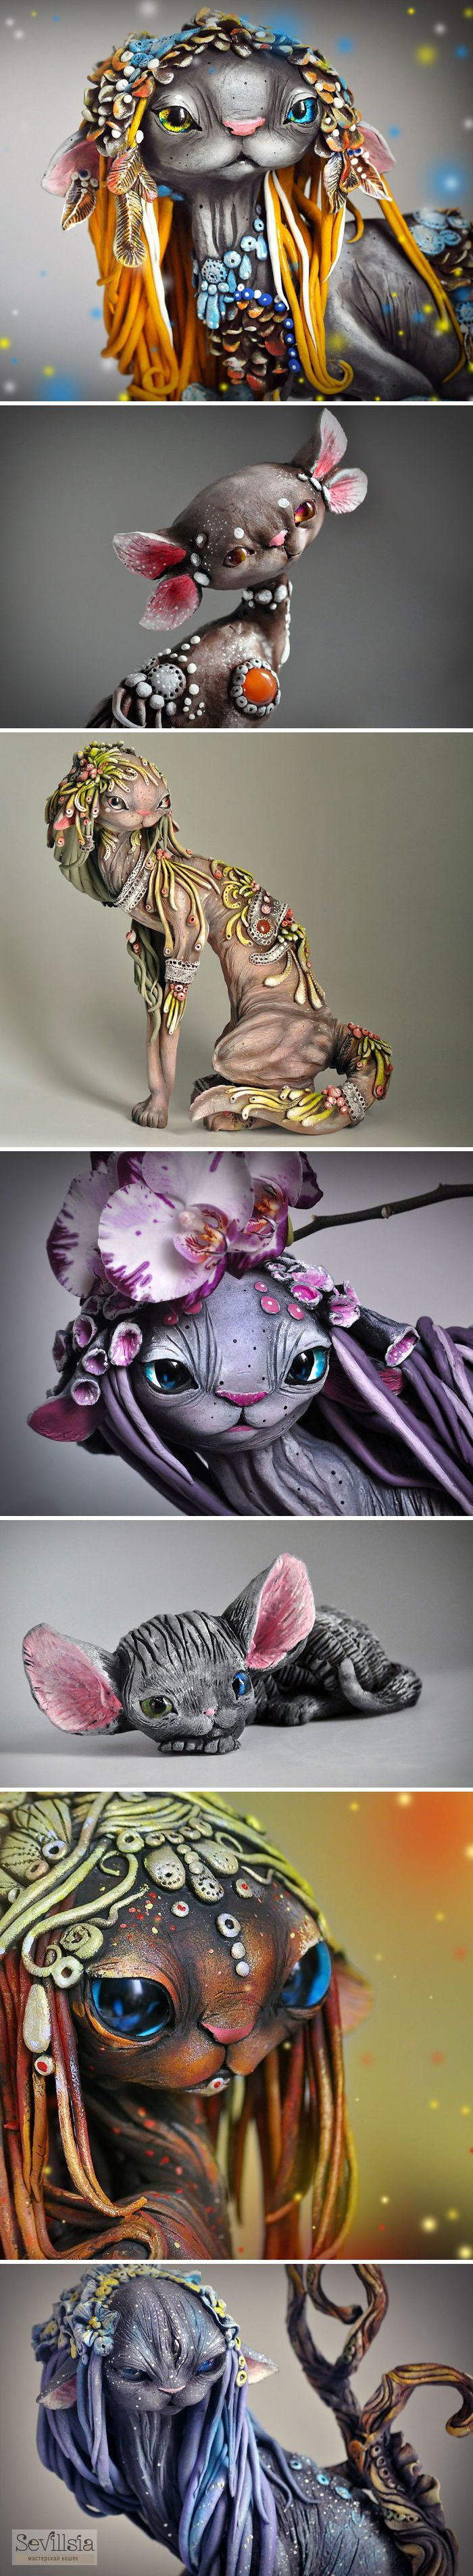 Russian Artist Victoria Serdyukova Sevillsia Combines Fantasy And Rasta Elements To Create Magical Cats of polymer clay